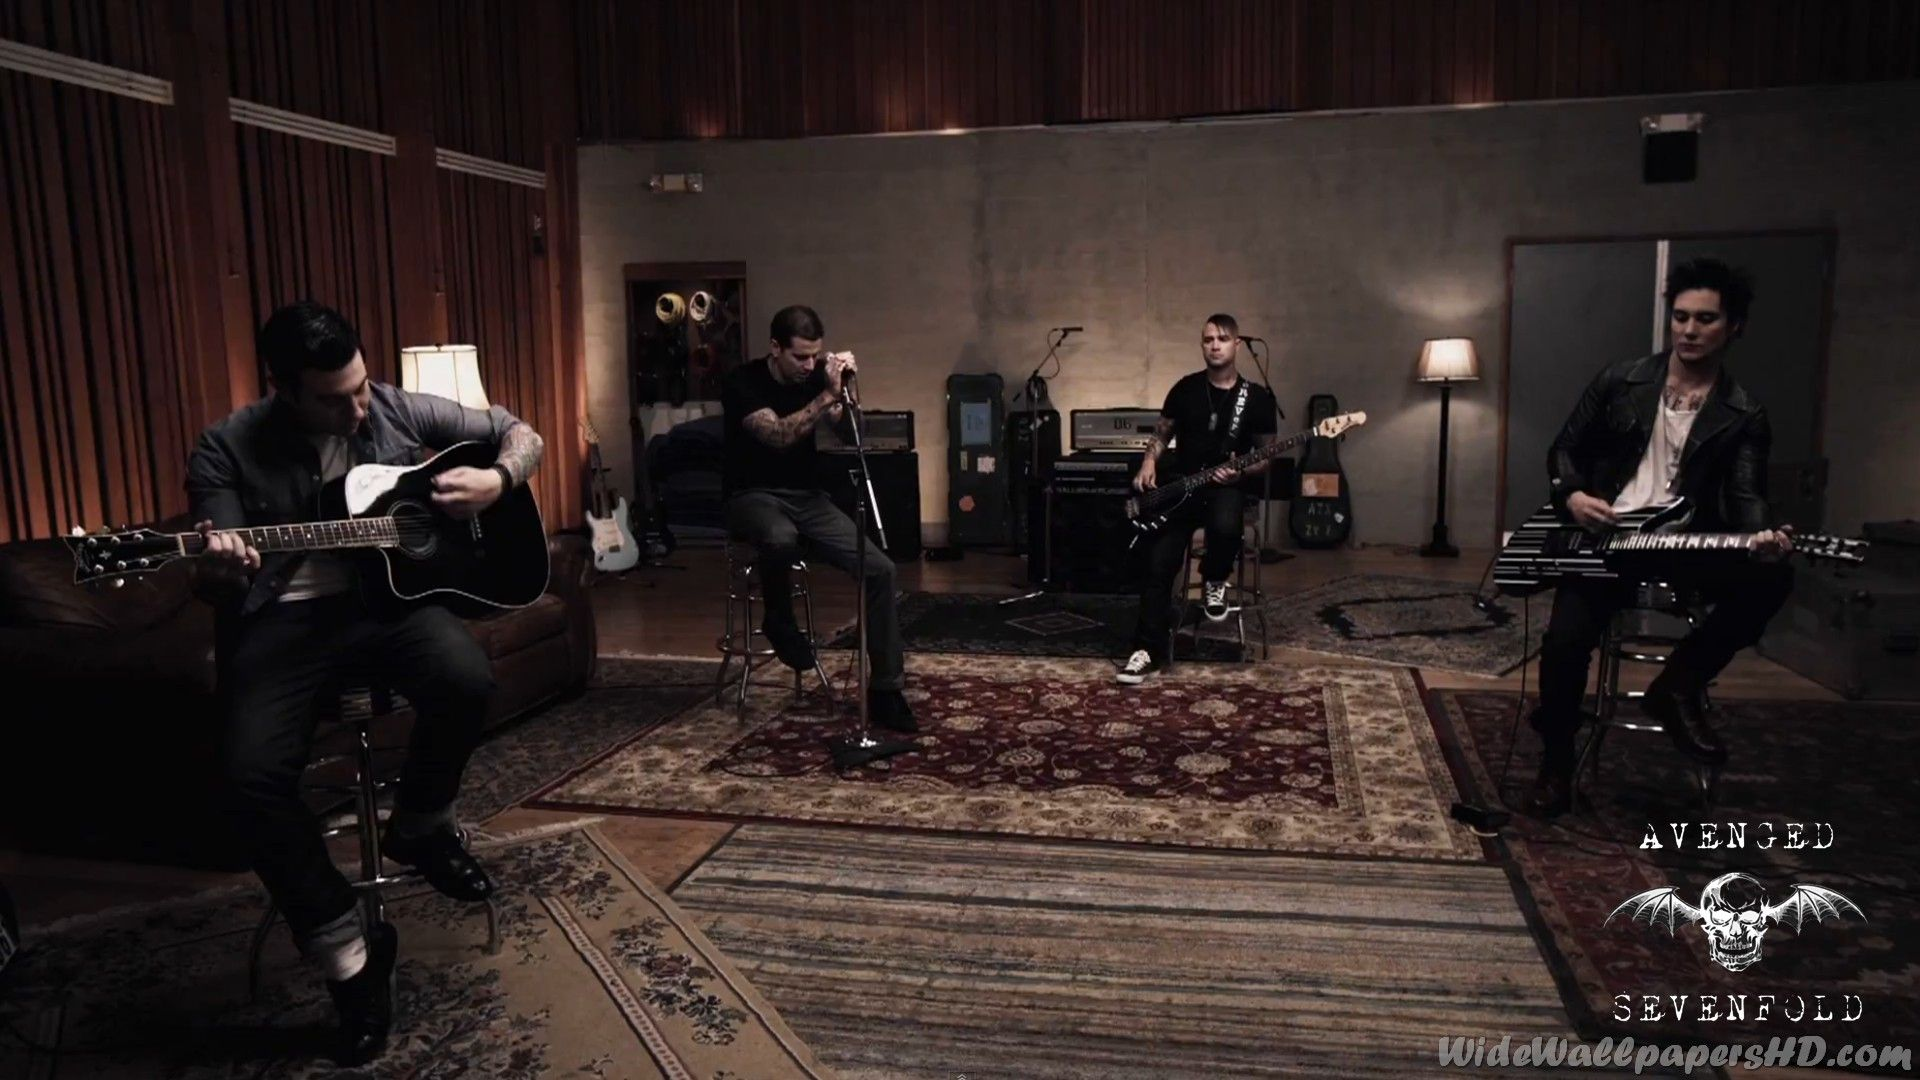 Avenged Sevenfold Images Avenged Sevenfold So Far Away Music Avenged Sevenfold Avenged Sevenfold Music Music Videos